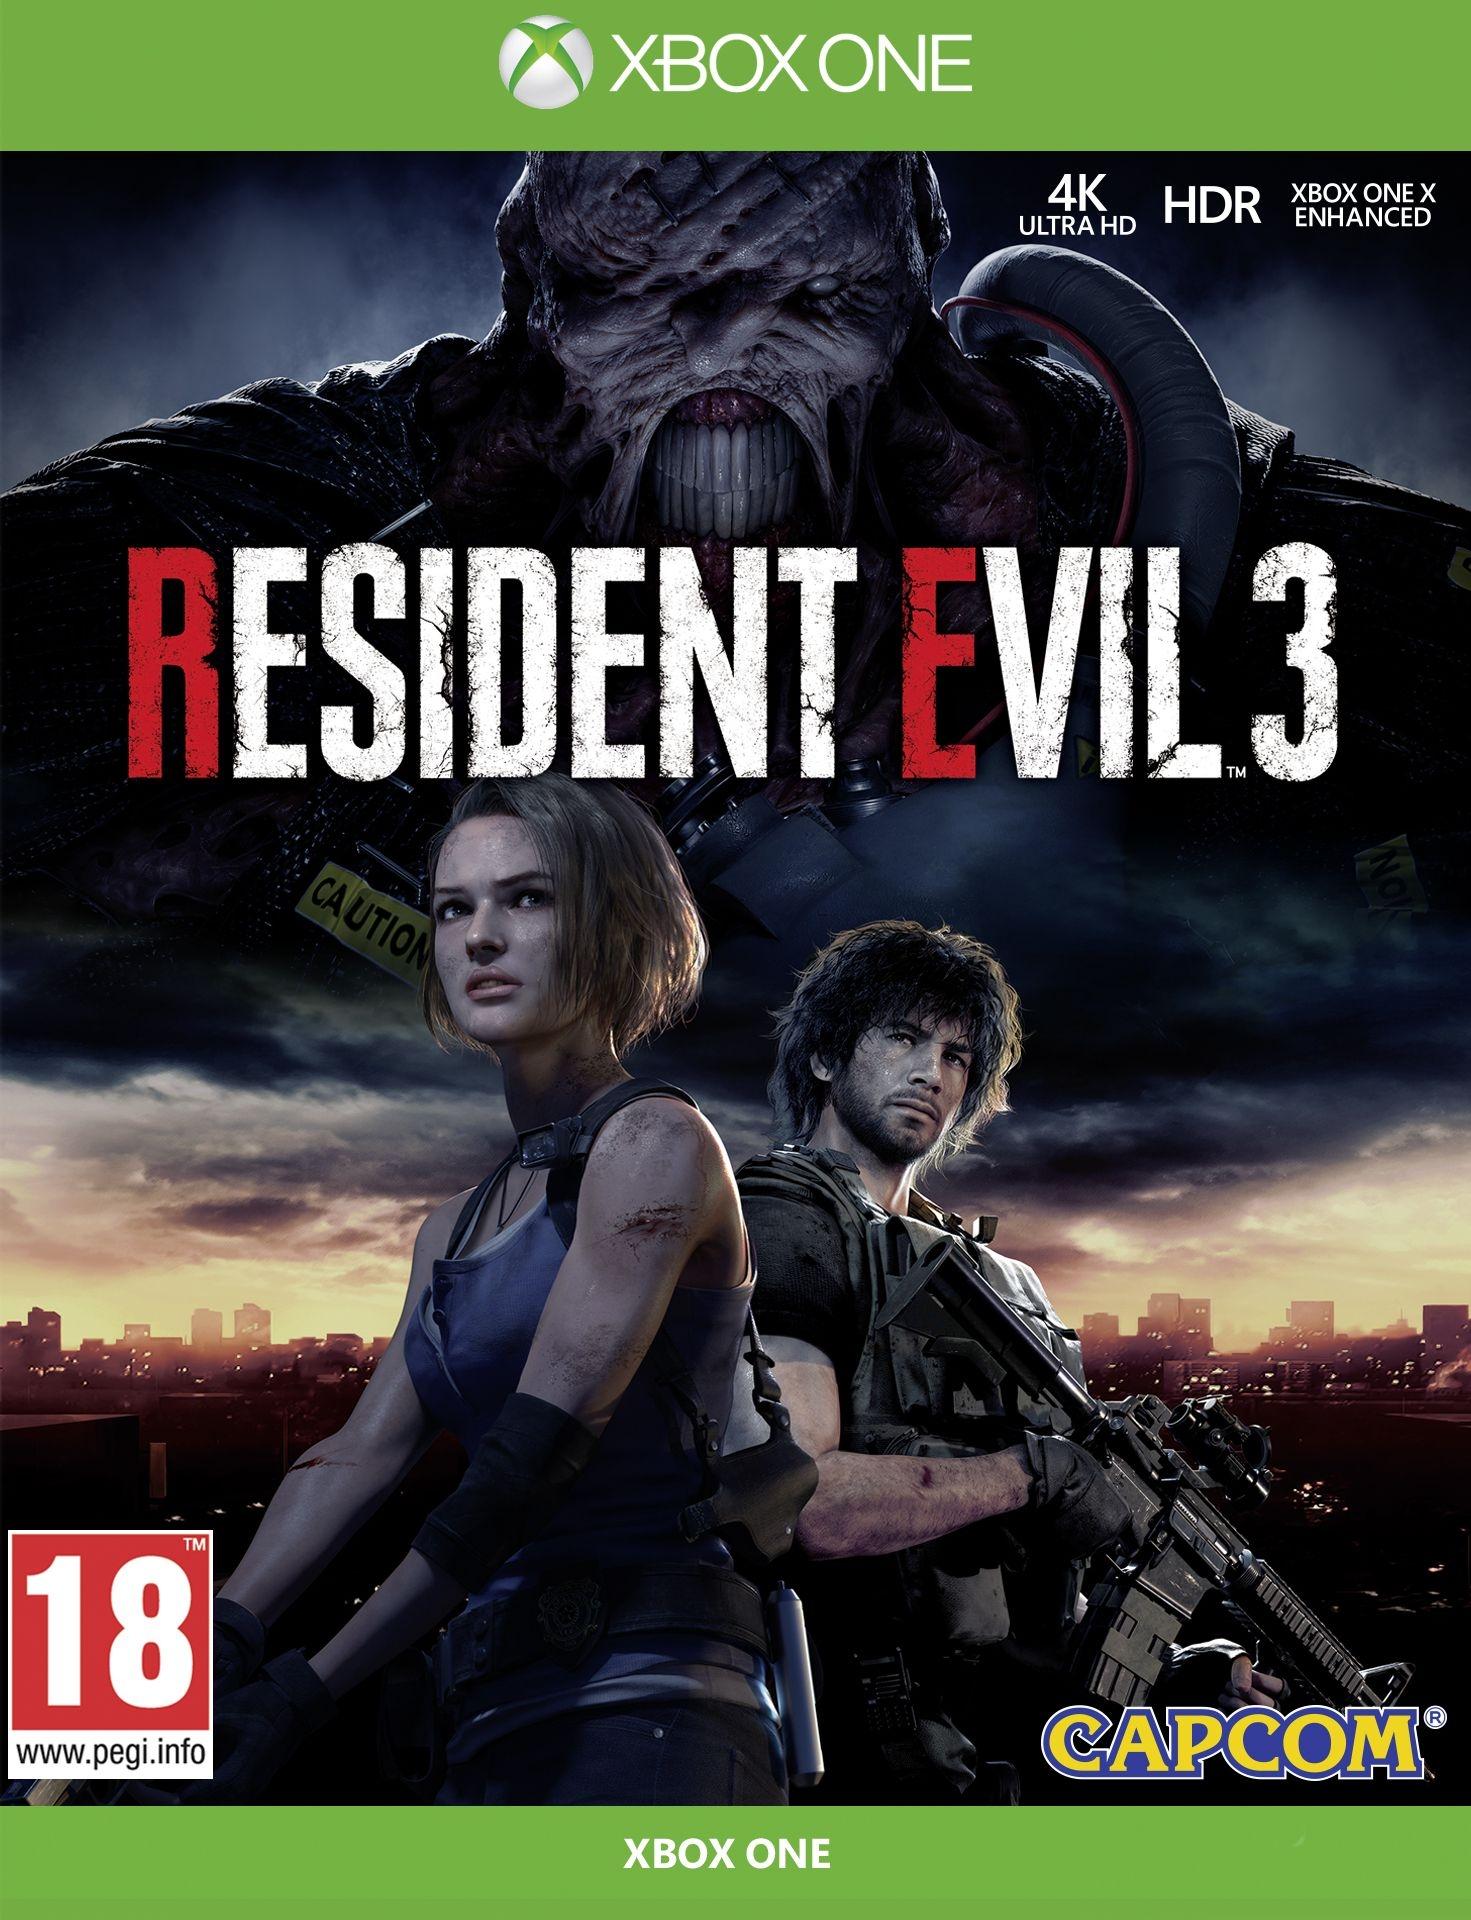 XBOXOne Resident Evil 3